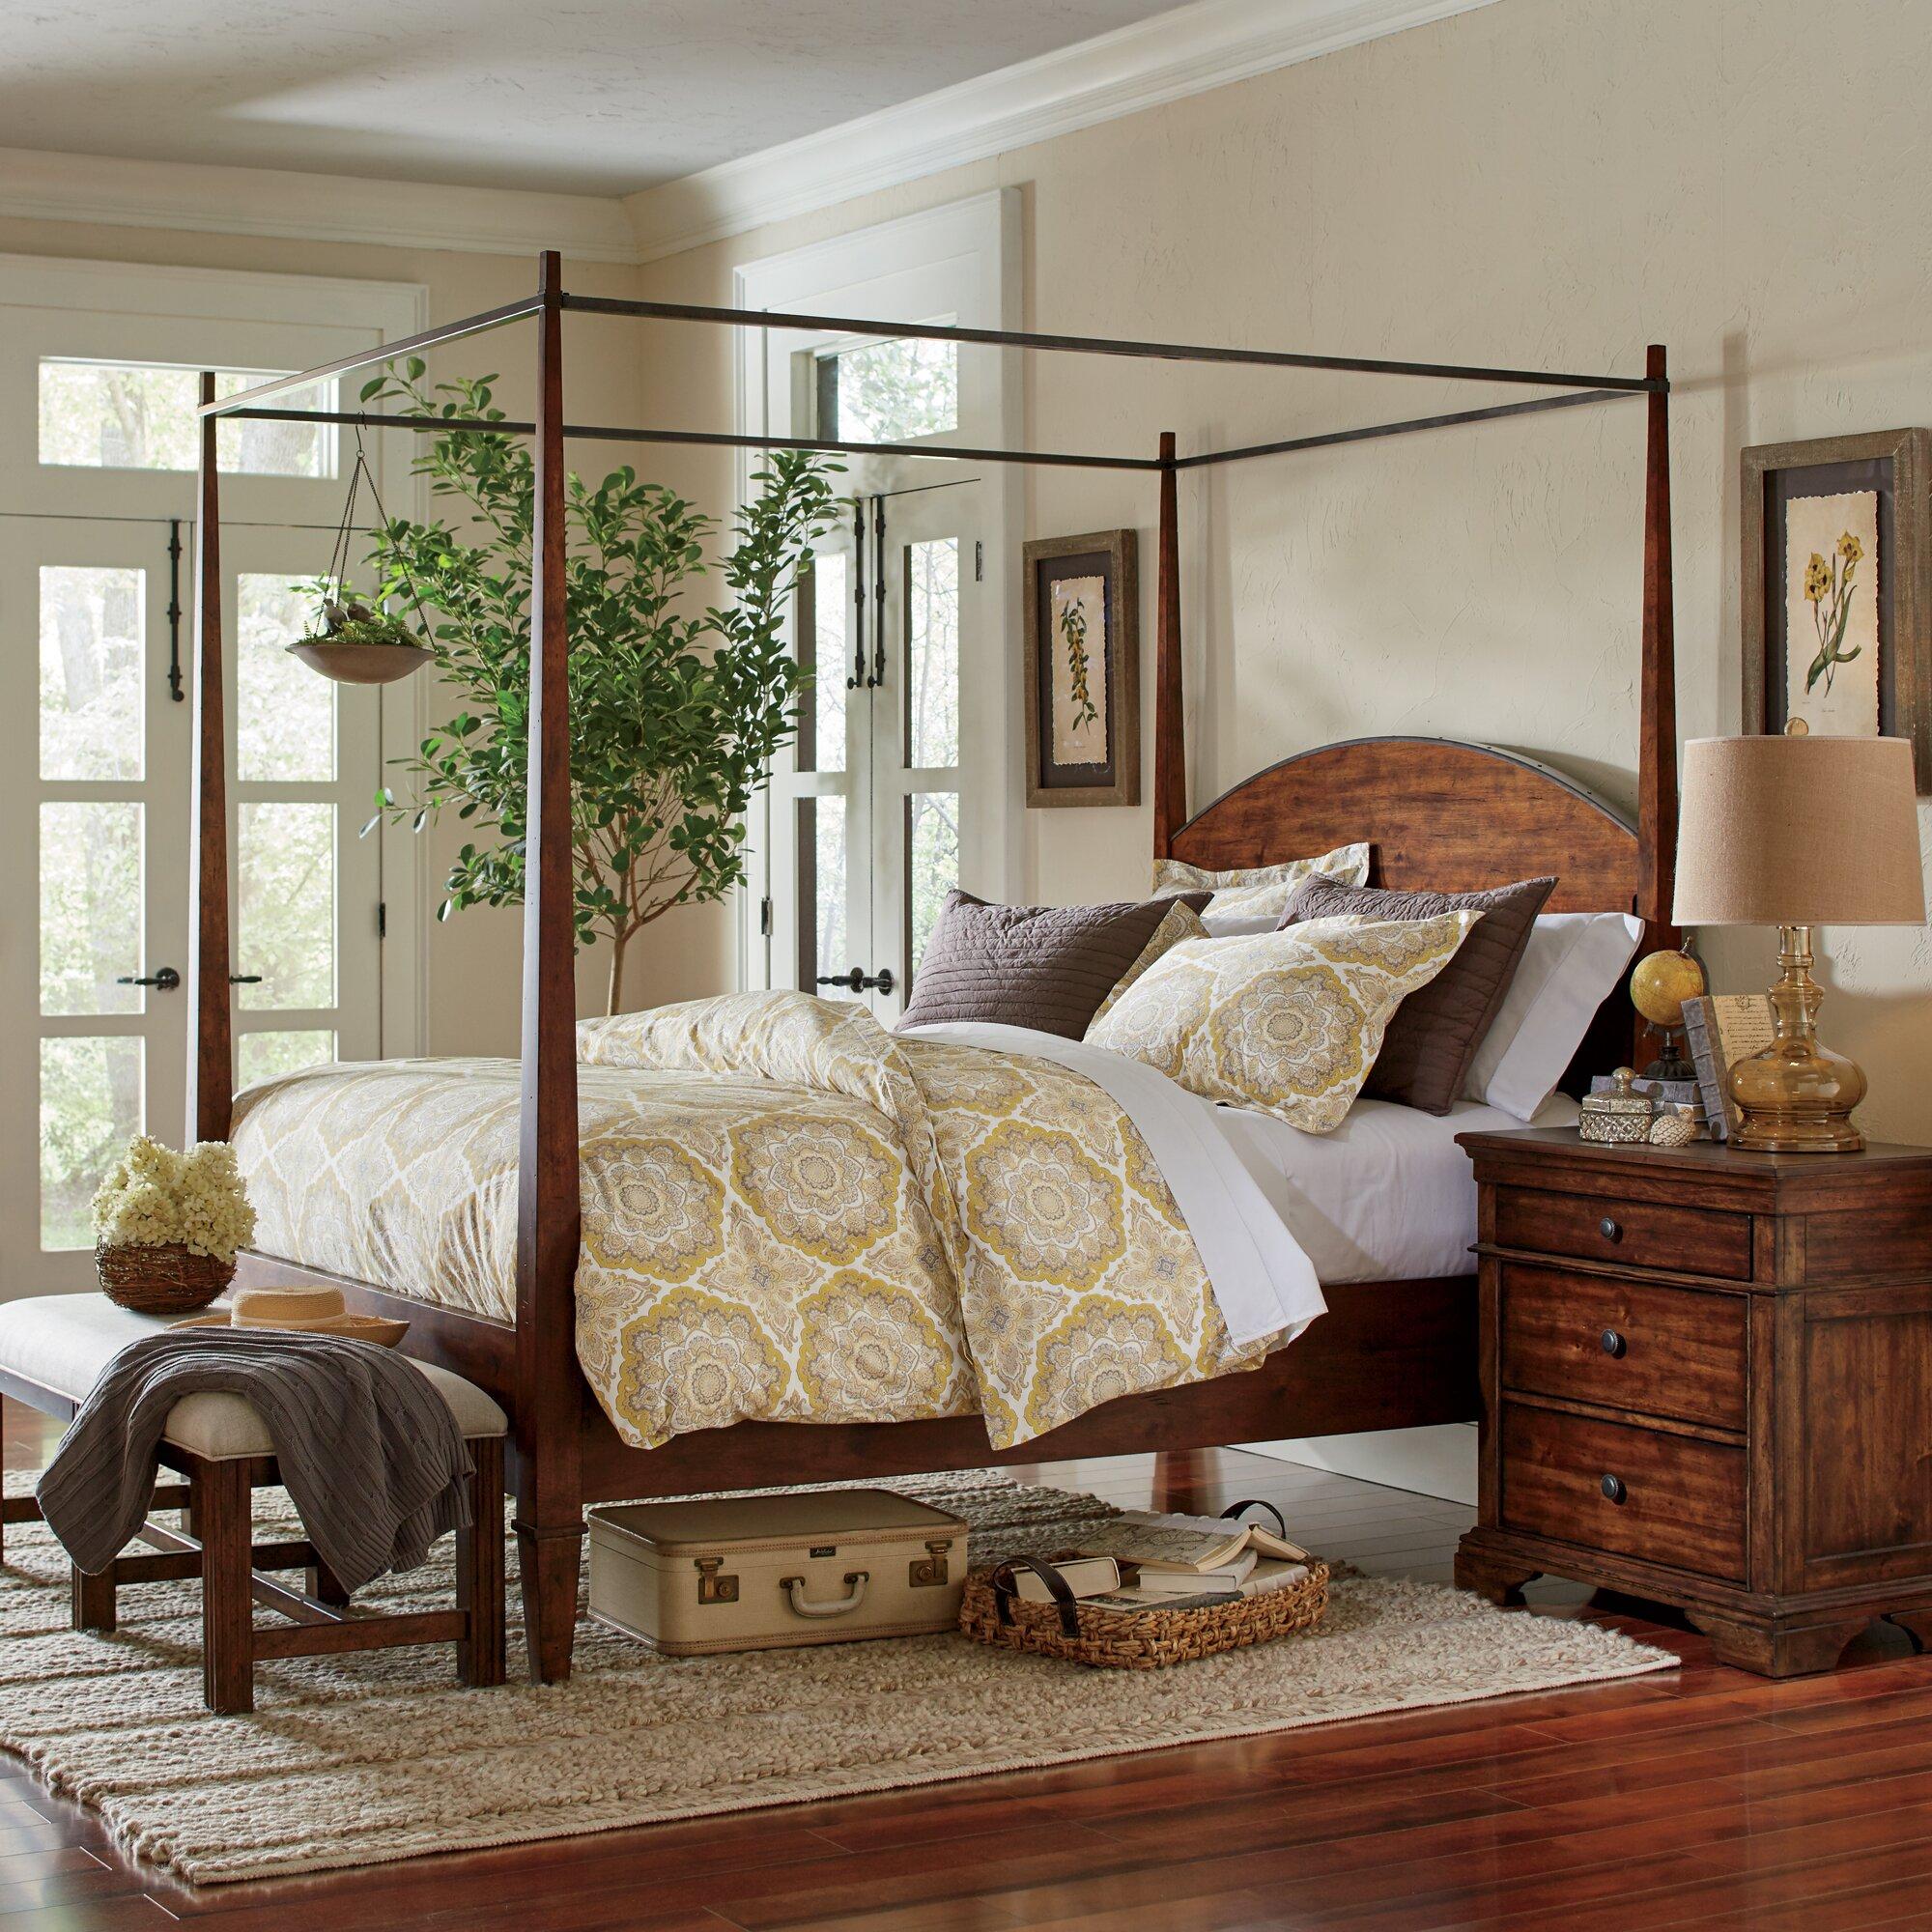 Varian Upholstered Storage Bedroom Bench Birchlane: Birch Lane Schaffer Upholstered Bench & Reviews